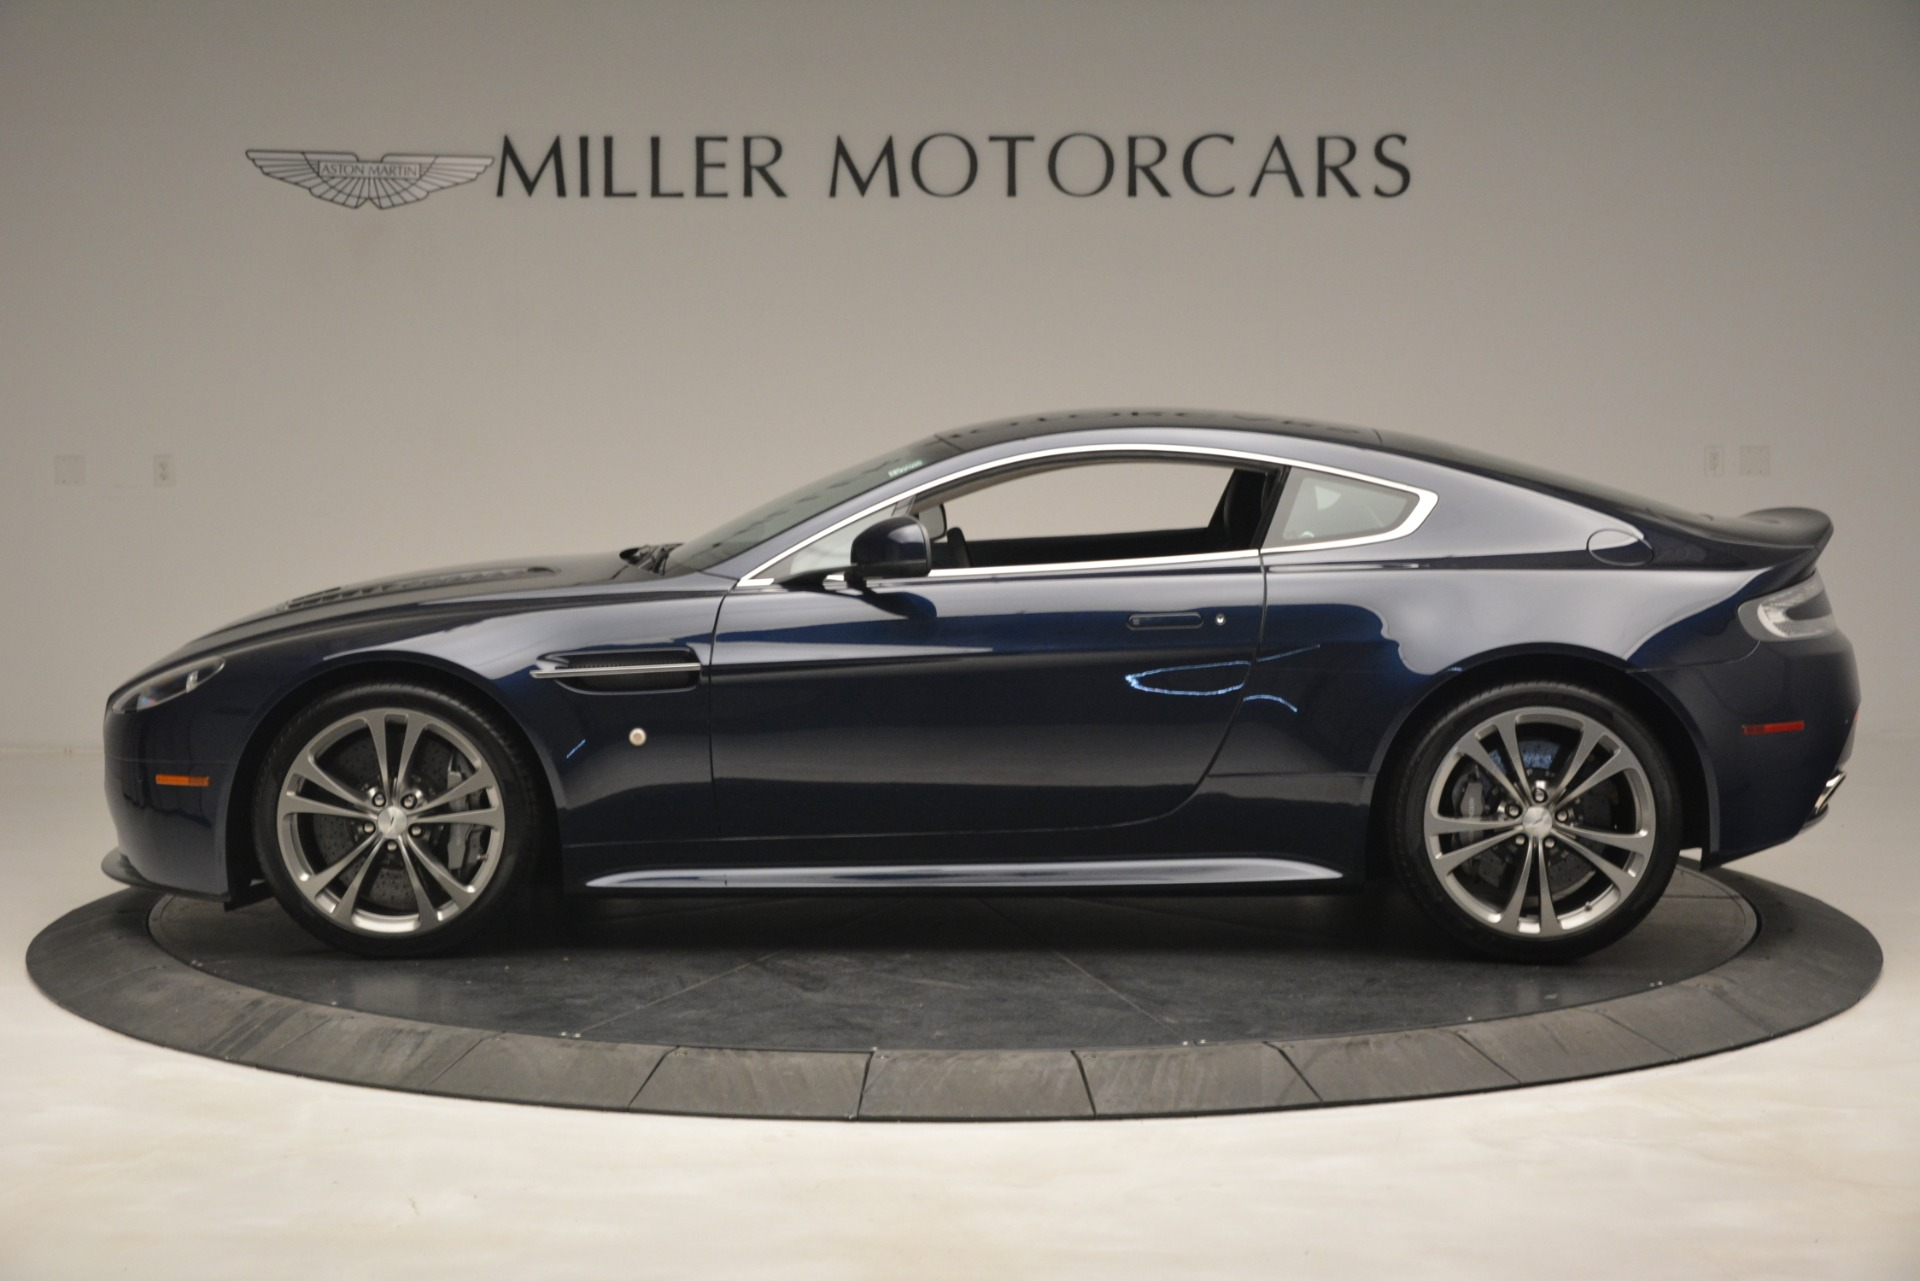 Used 2012 Aston Martin V12 Vantage  For Sale In Greenwich, CT 3046_p3